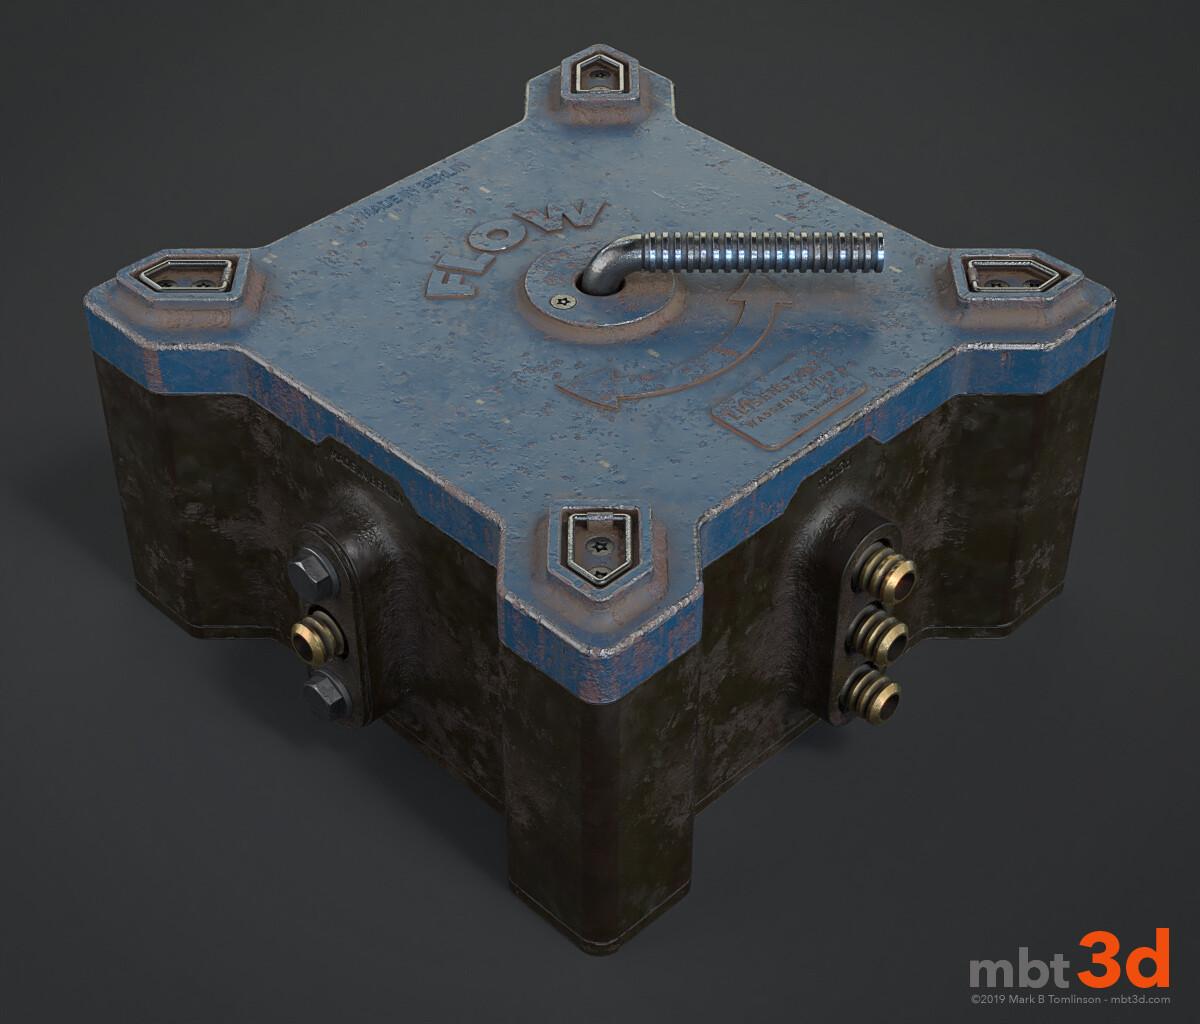 Mark b tomlinson flow box 04